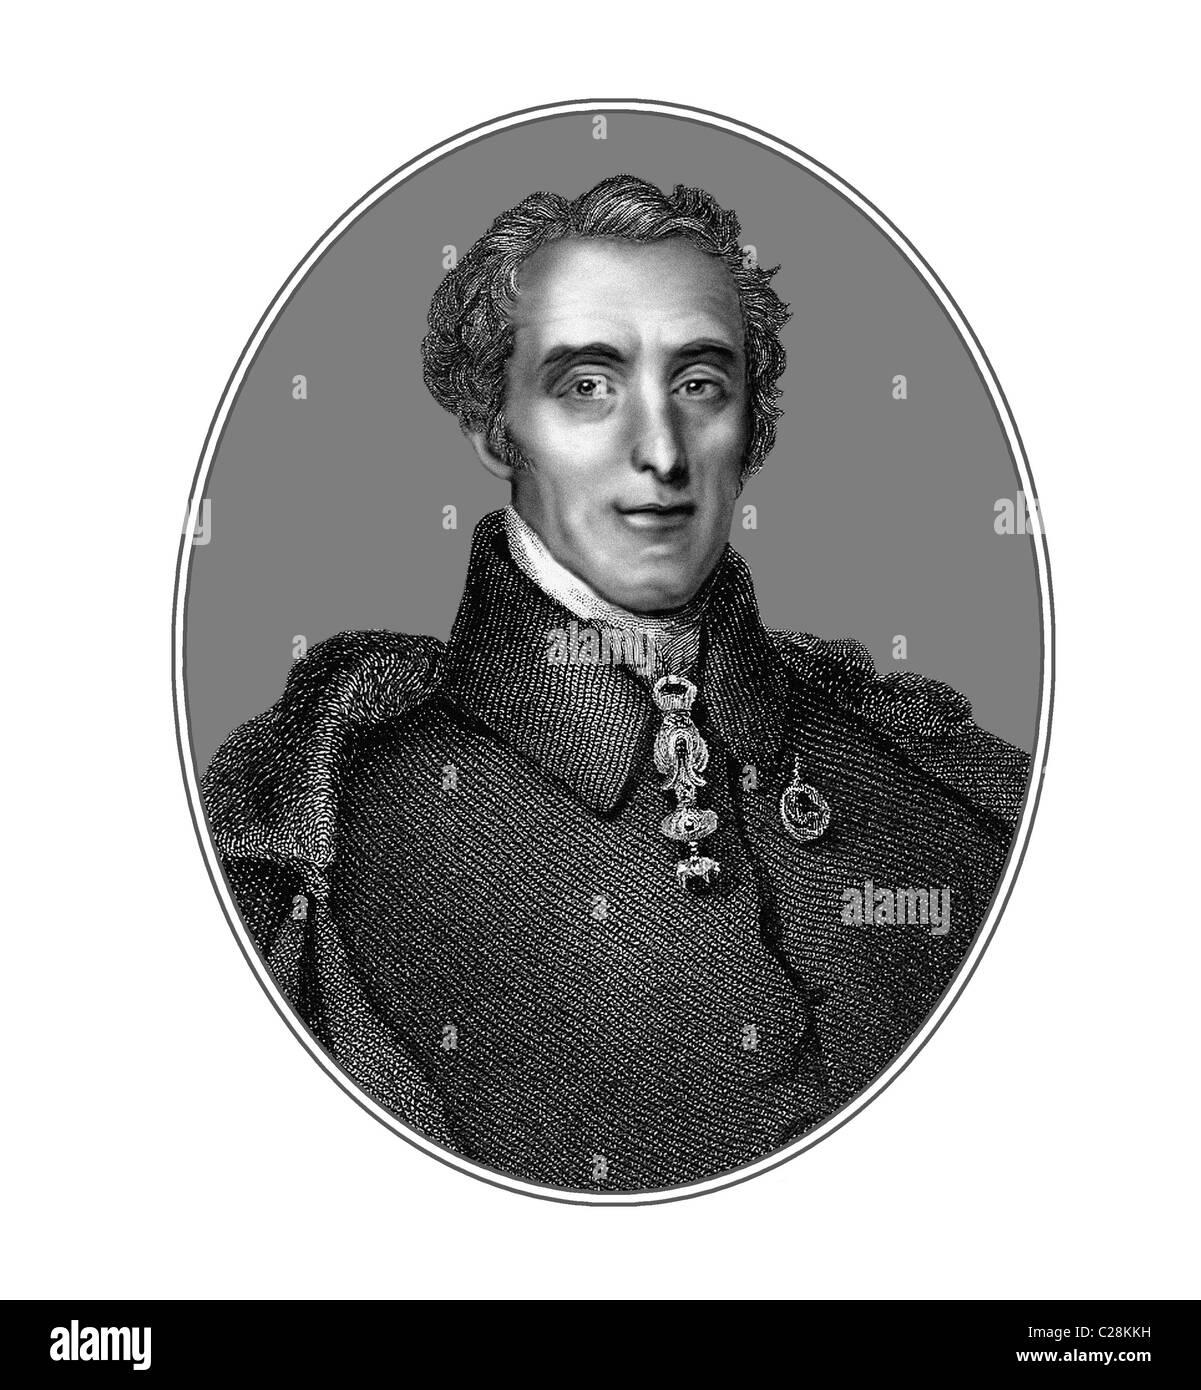 Duke of Wellington 1769 1852 Irish born Soldier Statesman Illustration from an Engraving - Stock Image